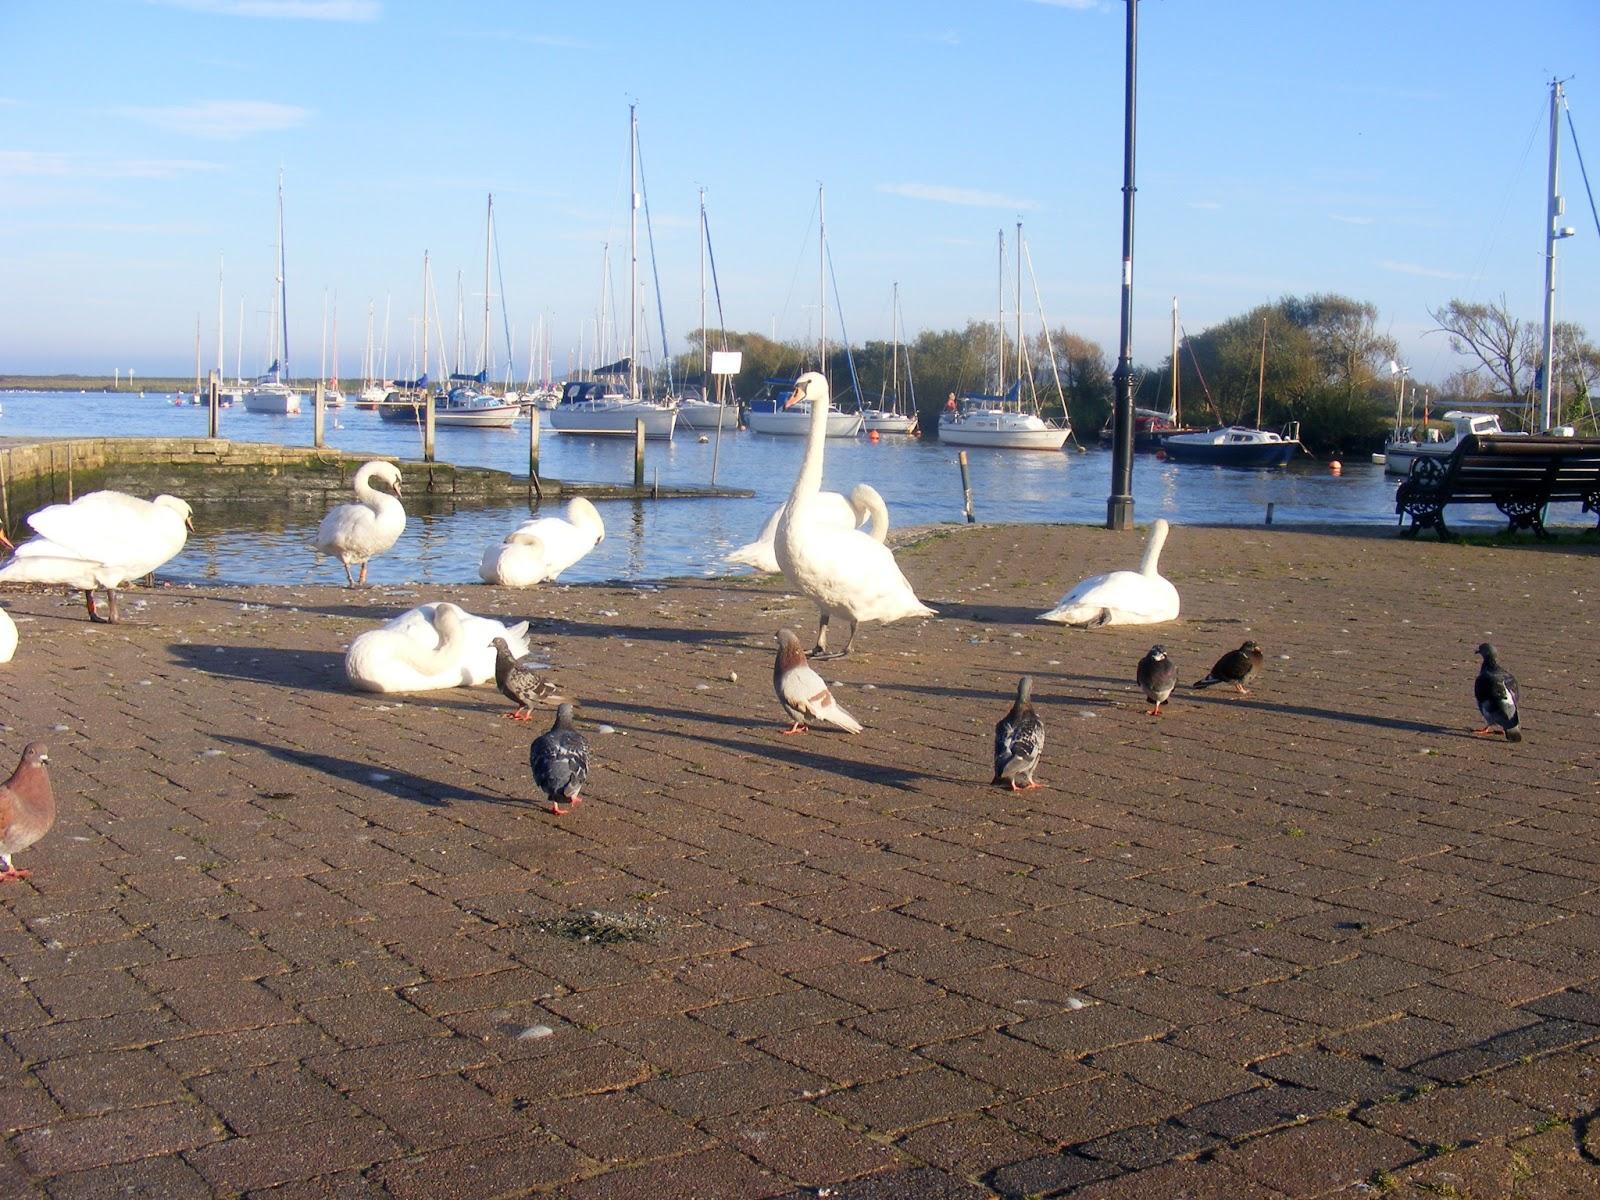 bay swans, seegulls